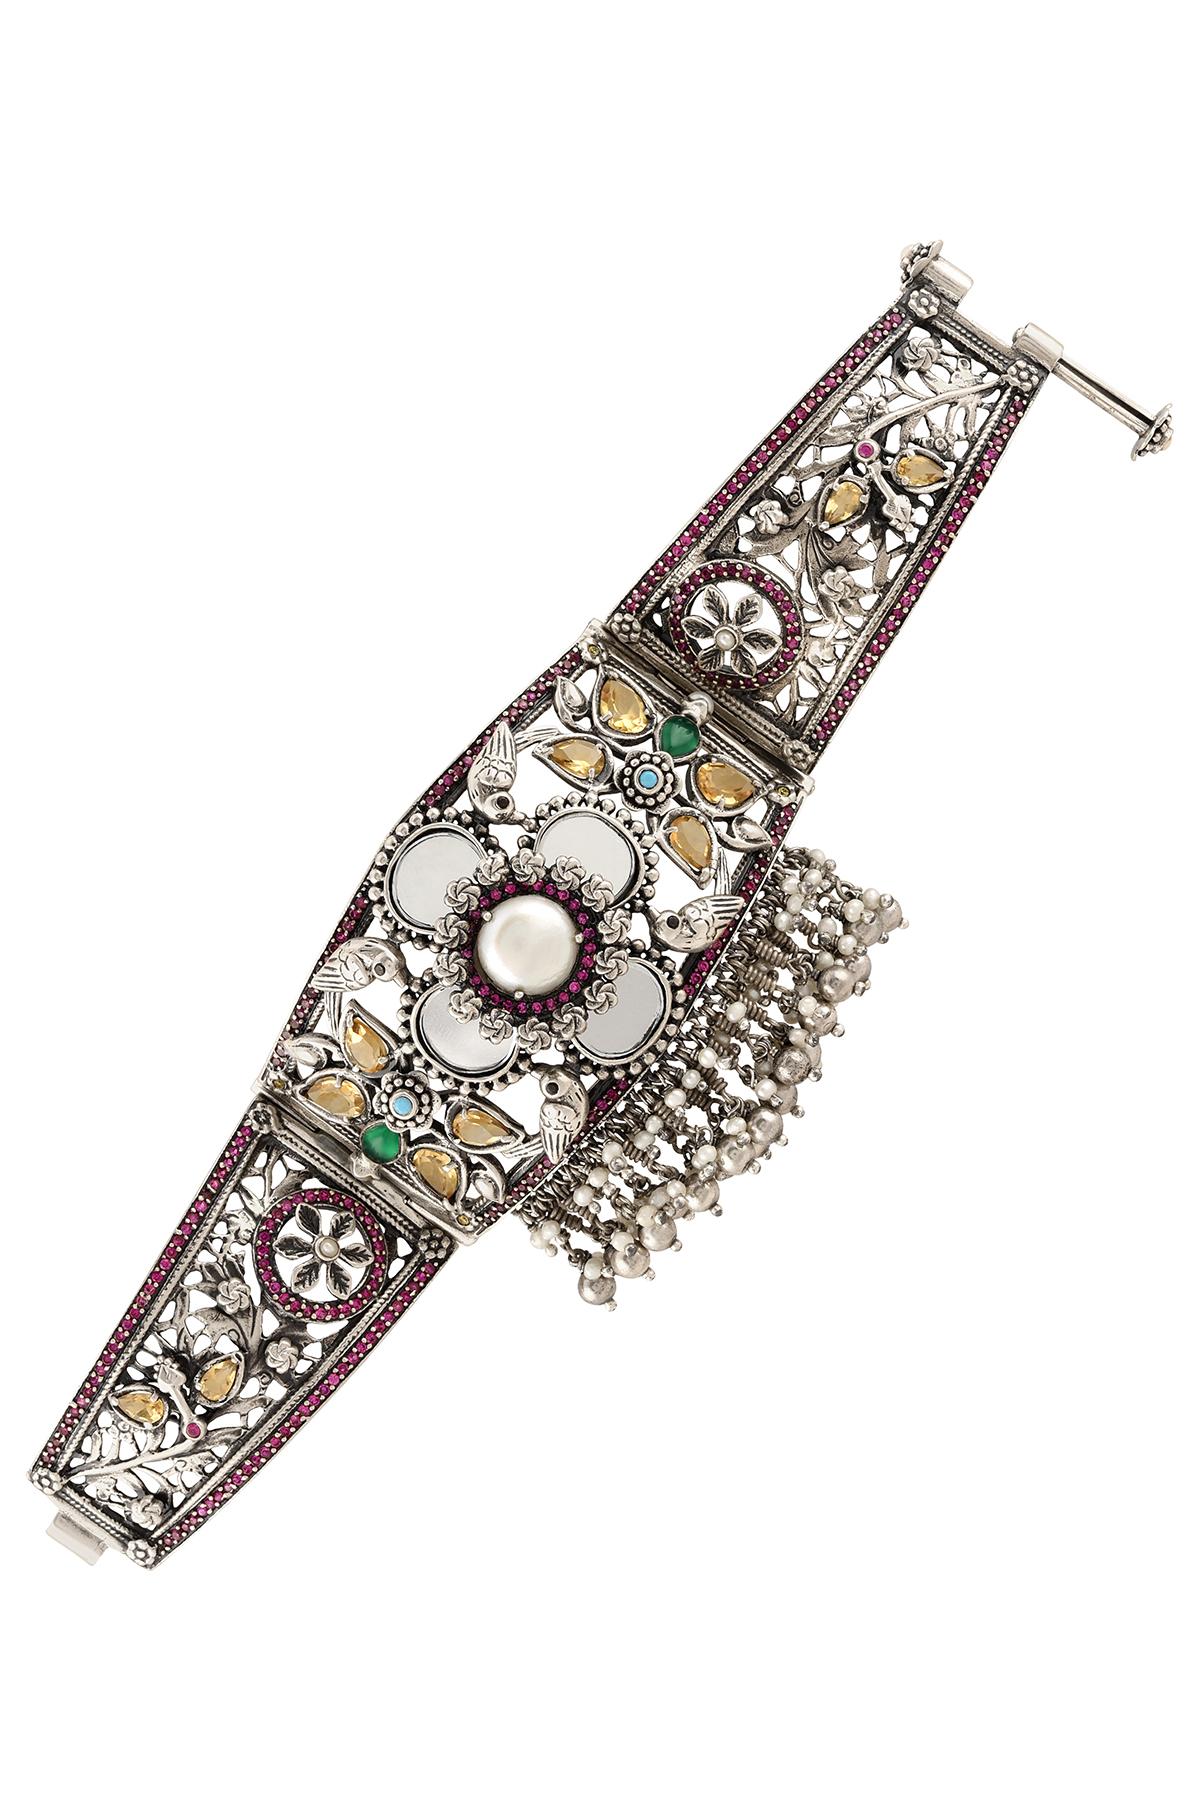 Silver Suryakamal Handcuff